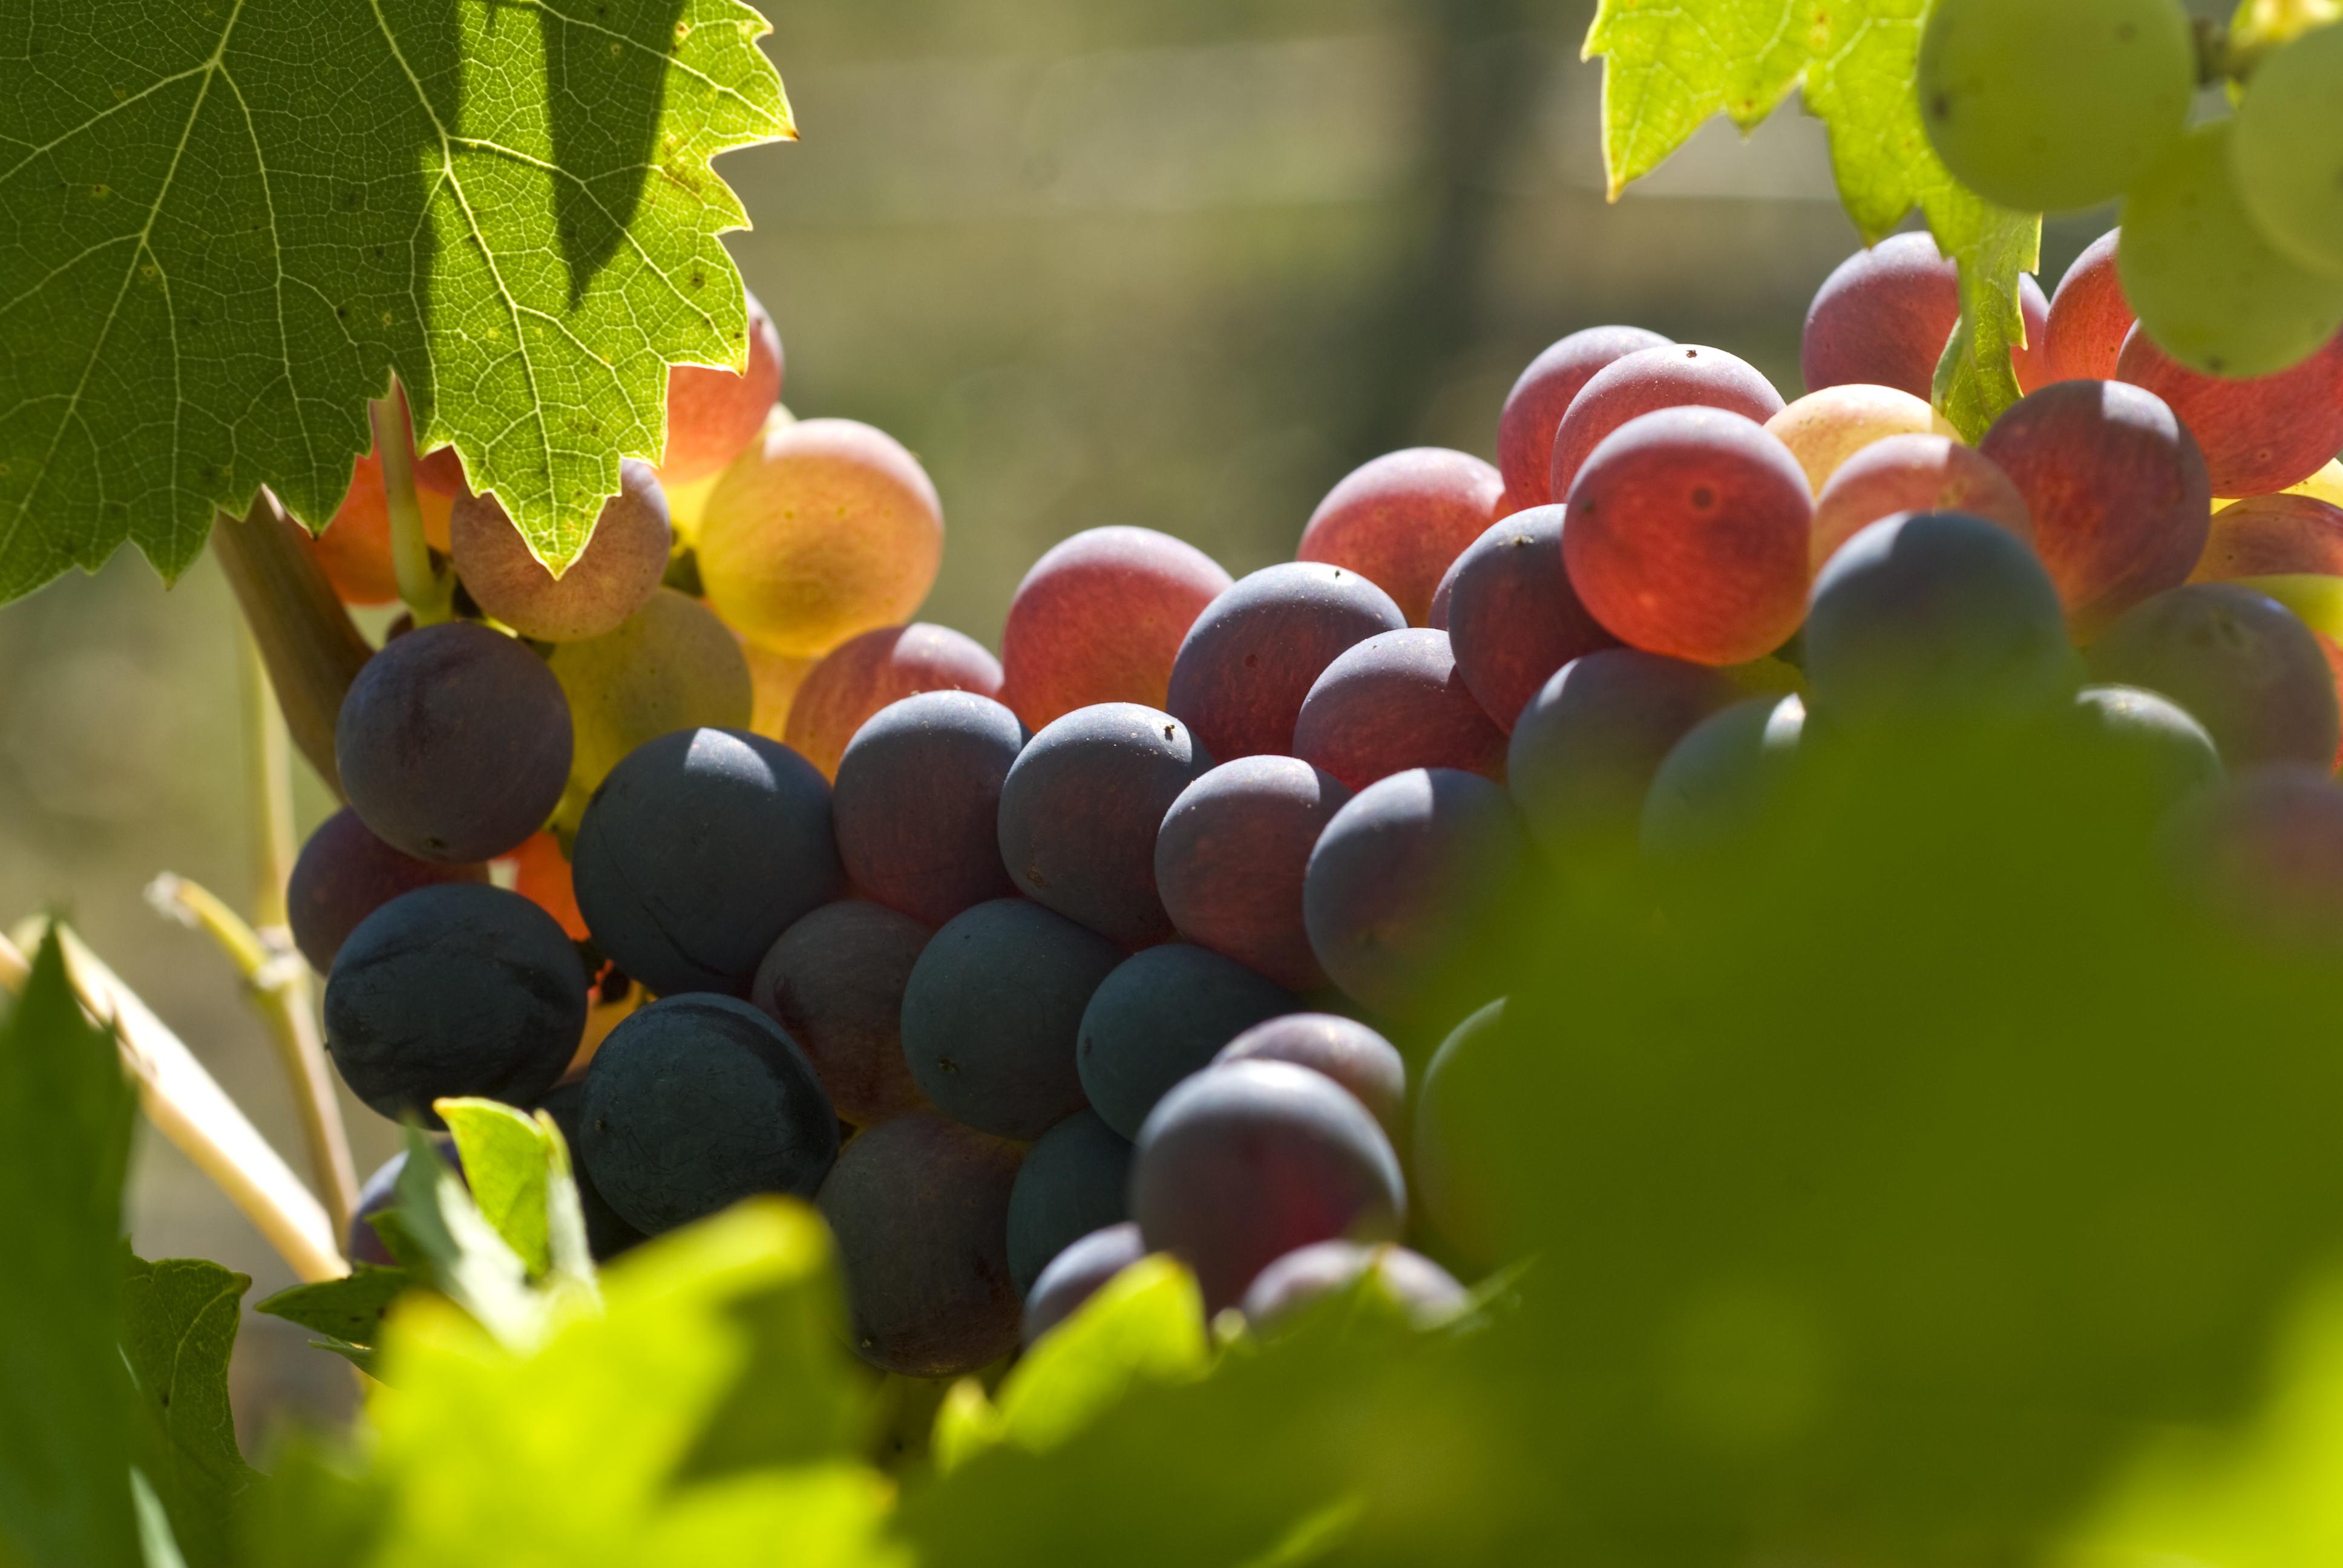 Grapes2.jpg